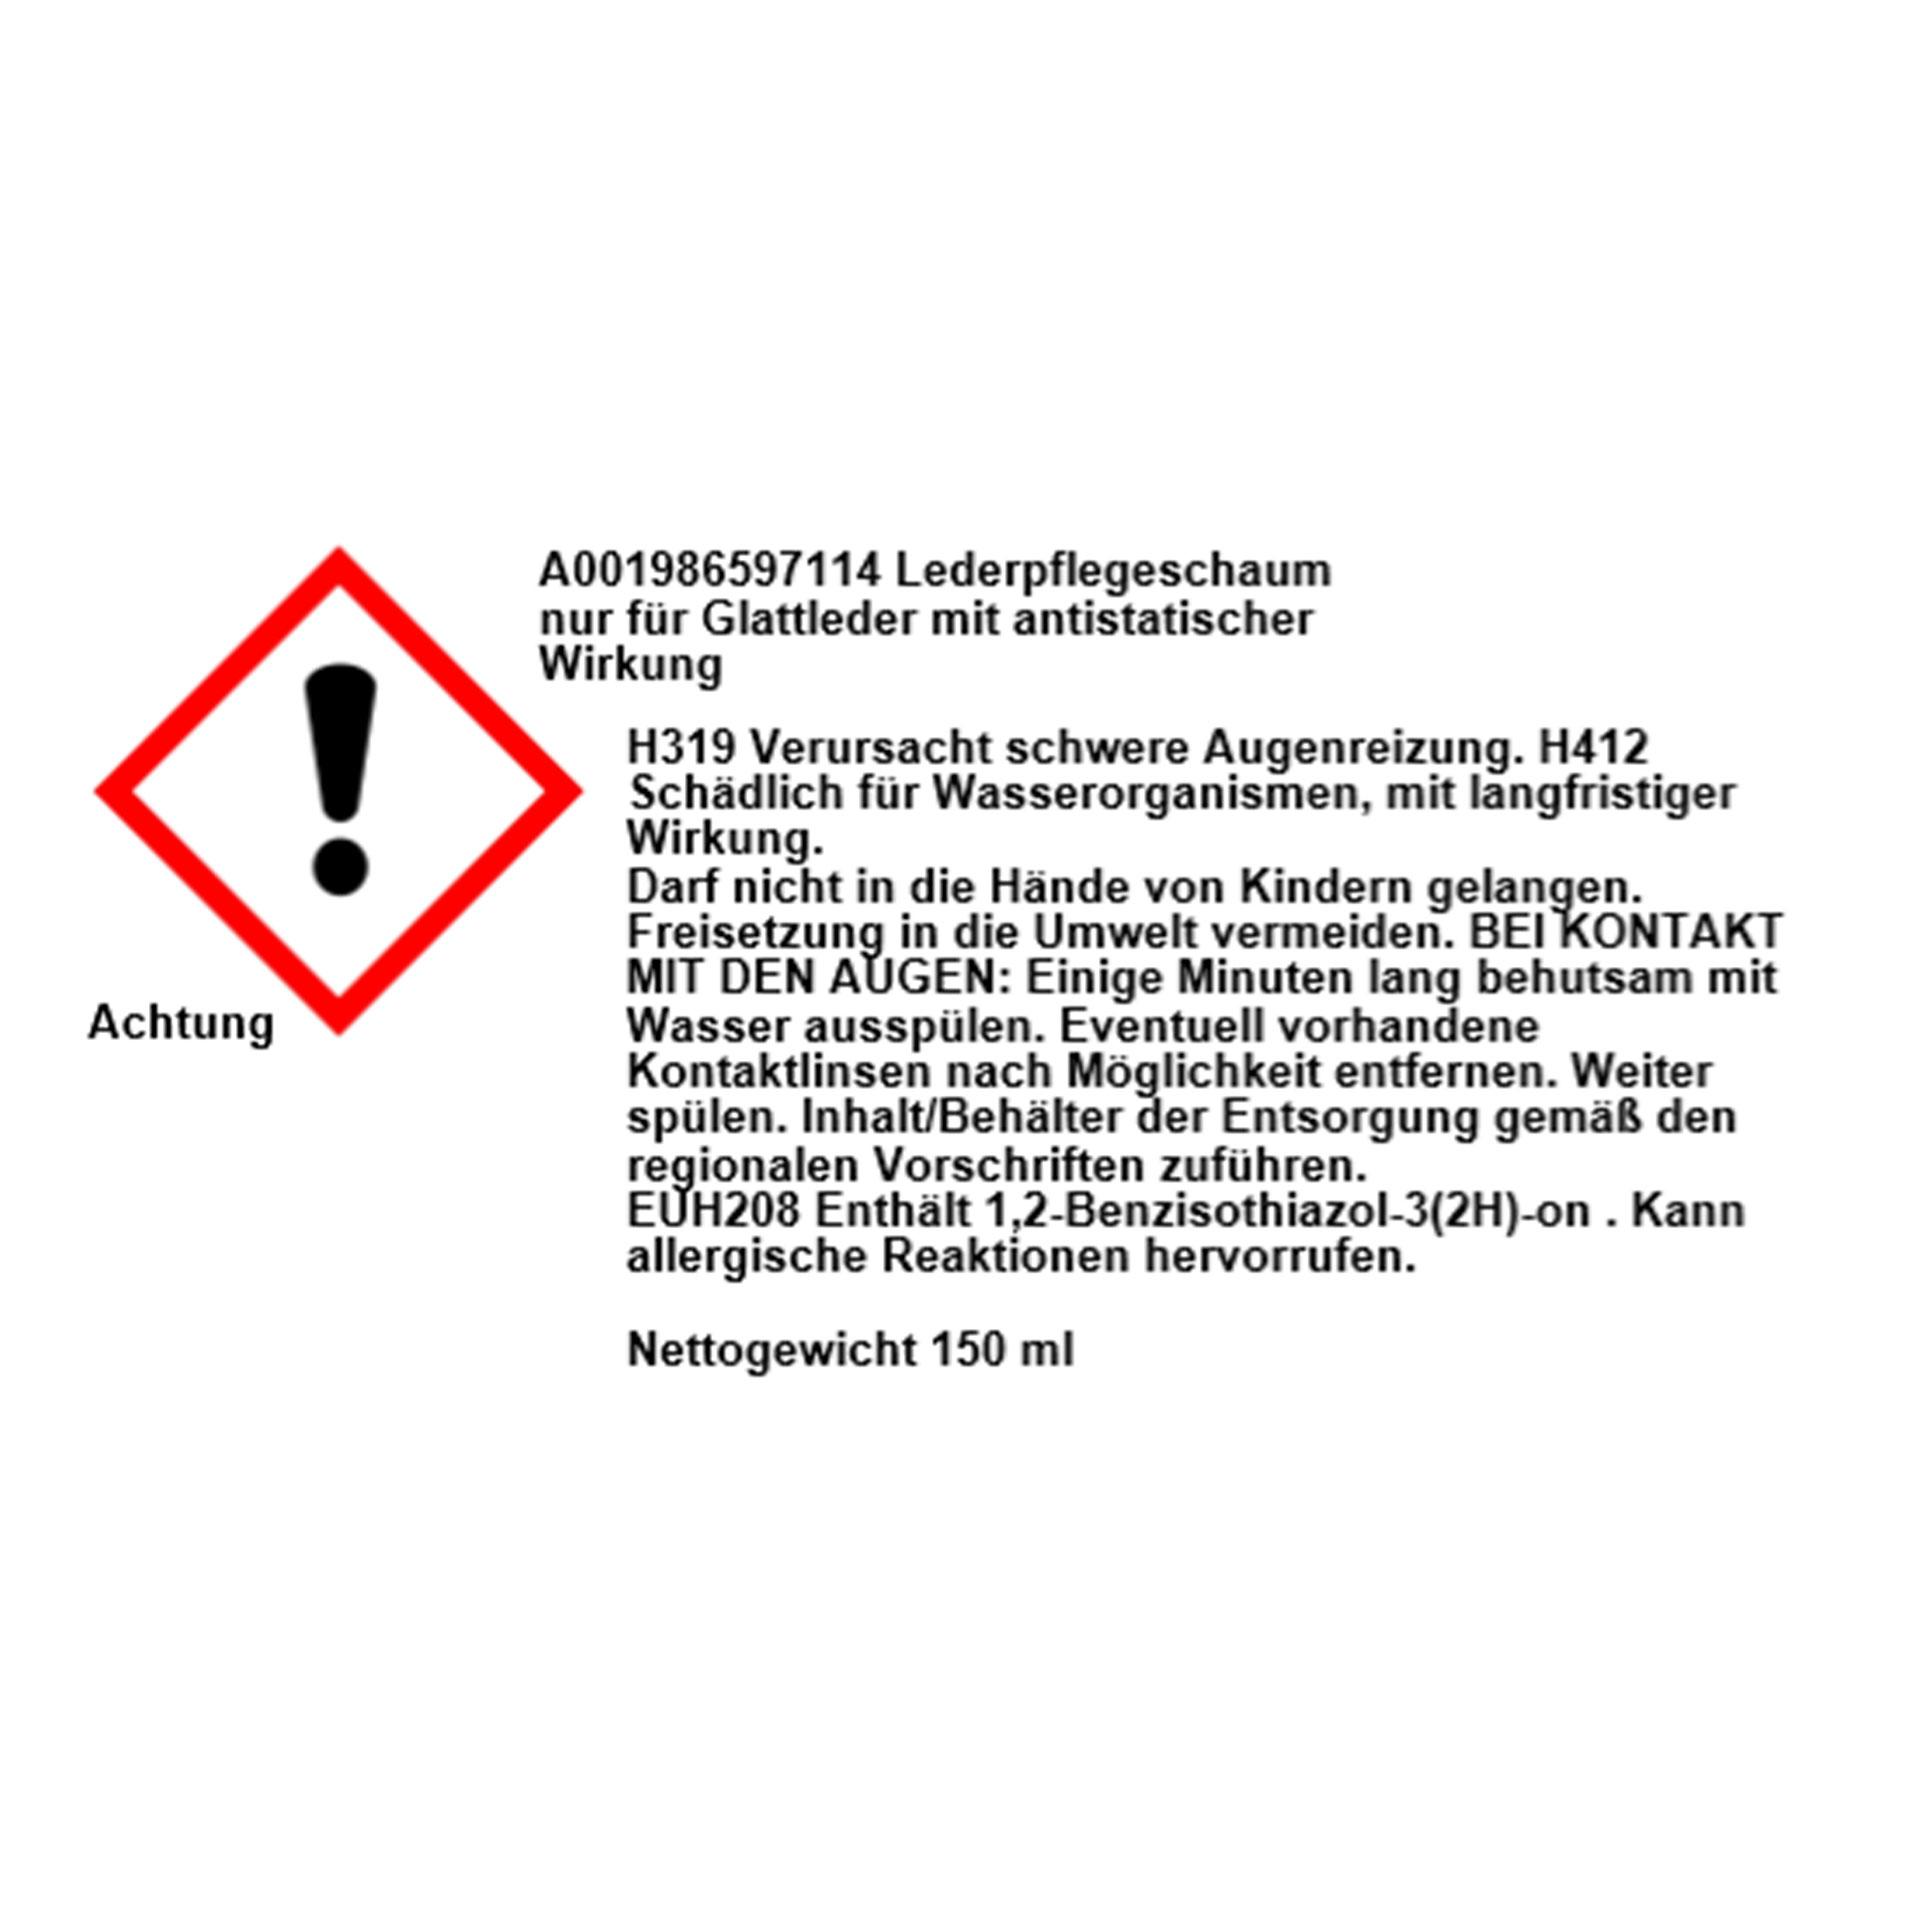 Mercedes-Benz Lederpflegeschaum Lederpflege 150 ml